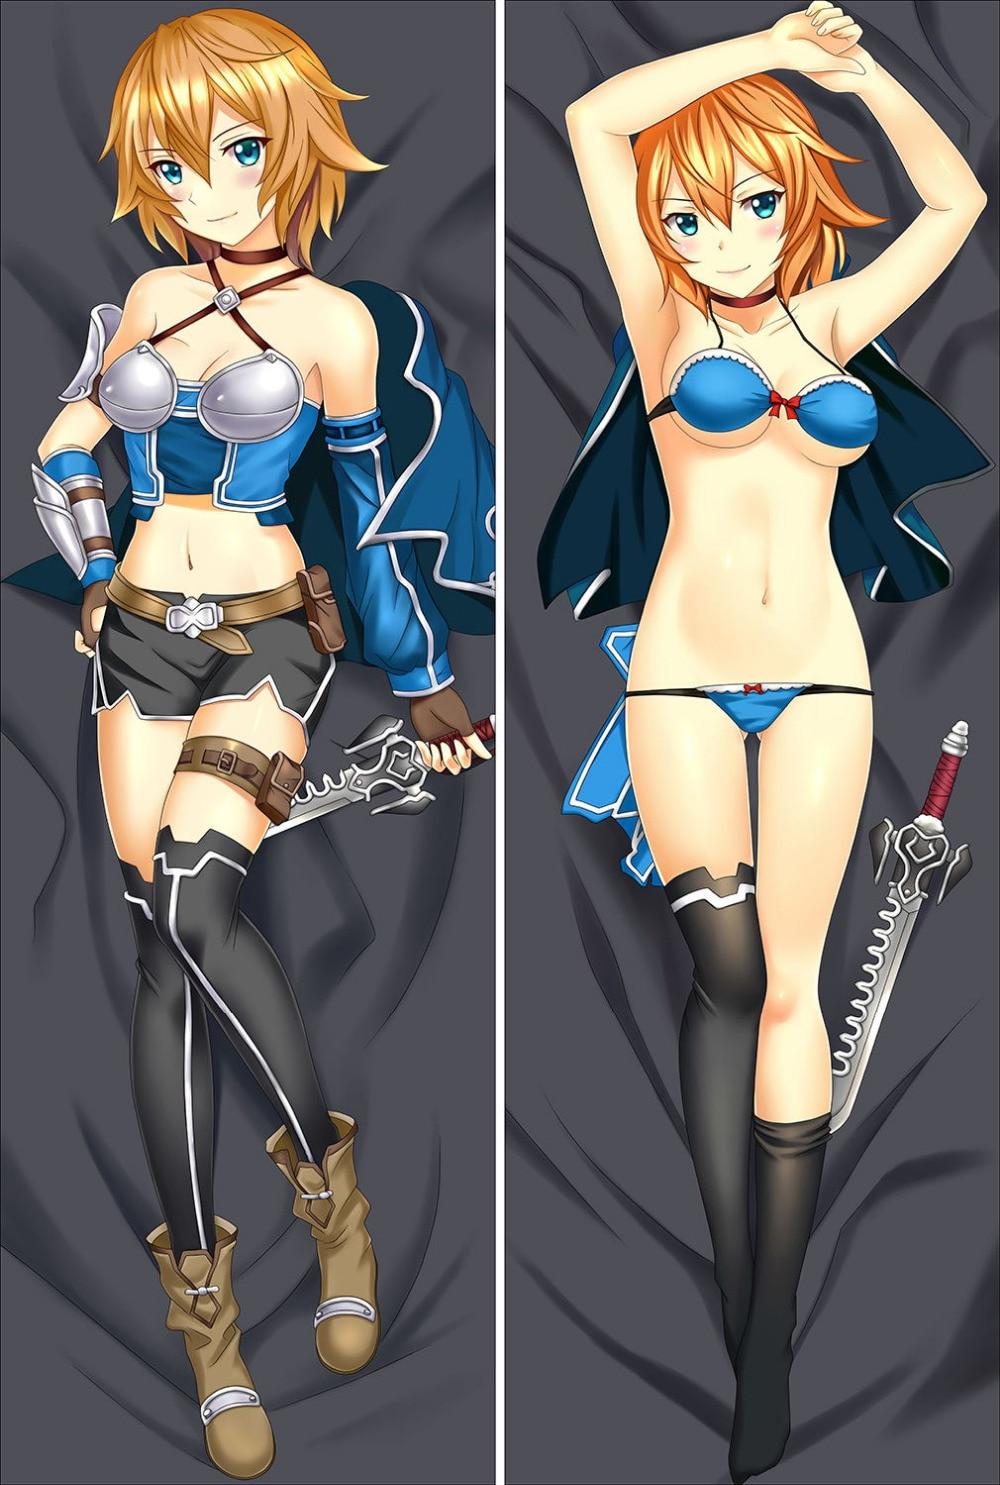 Sword art online philia hentai